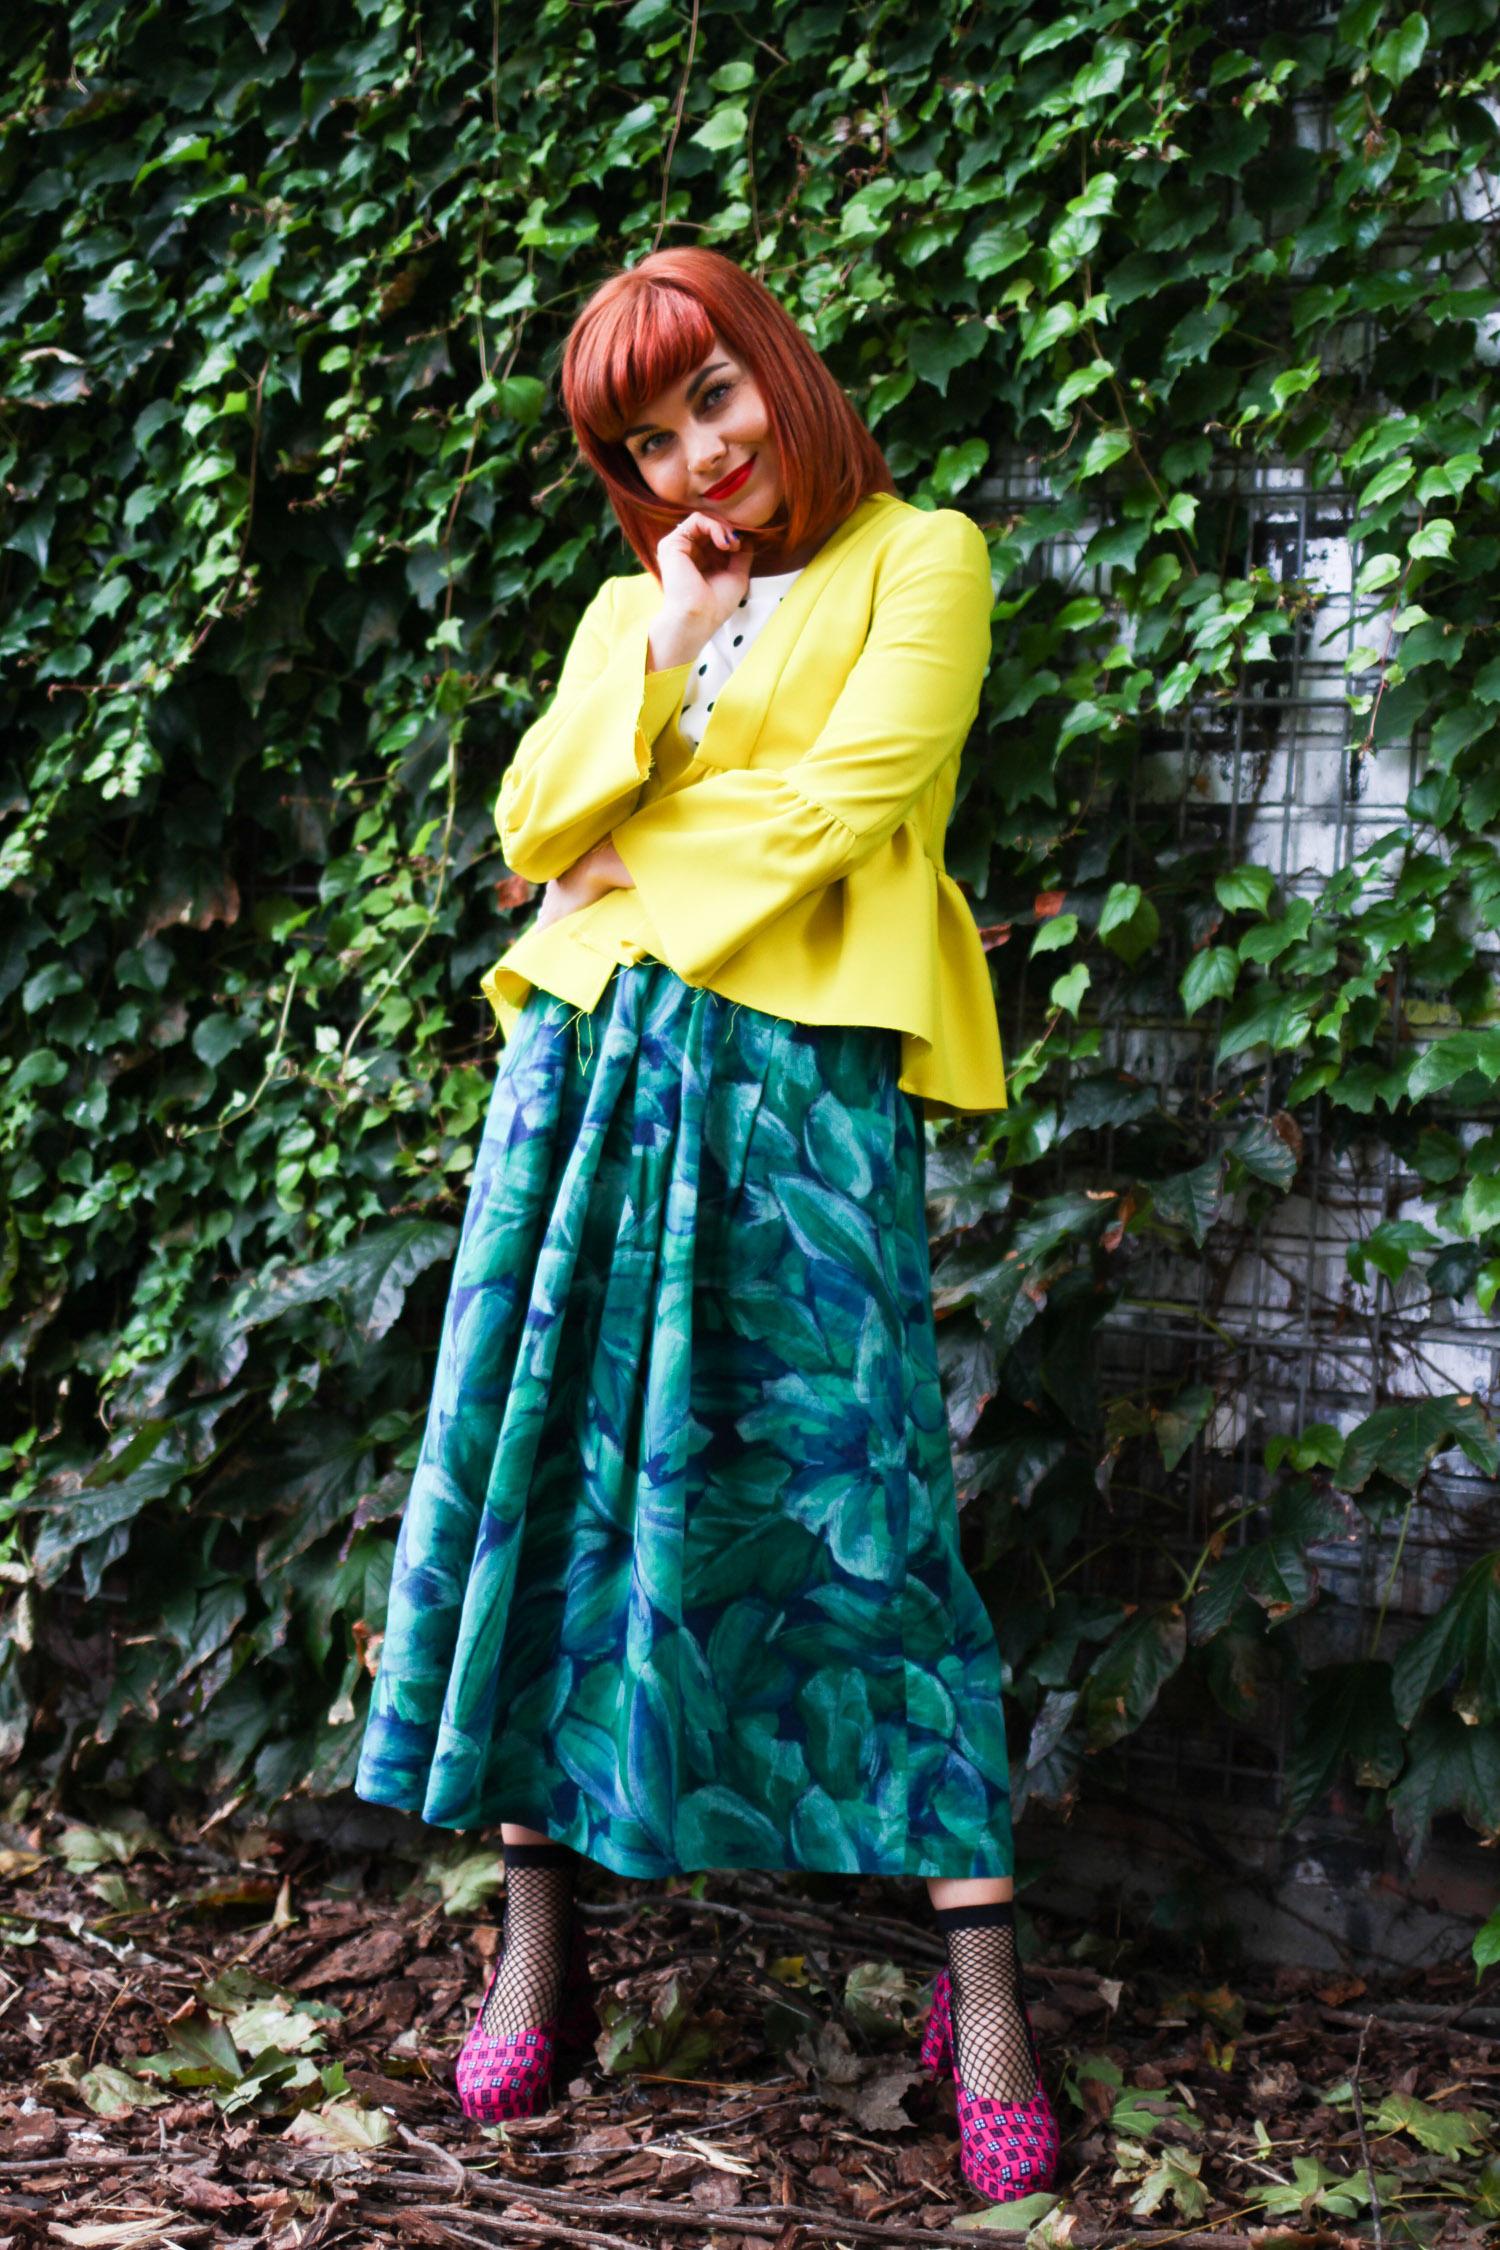 MyRainbowFeeling_Blogfotos_Mathilde-9